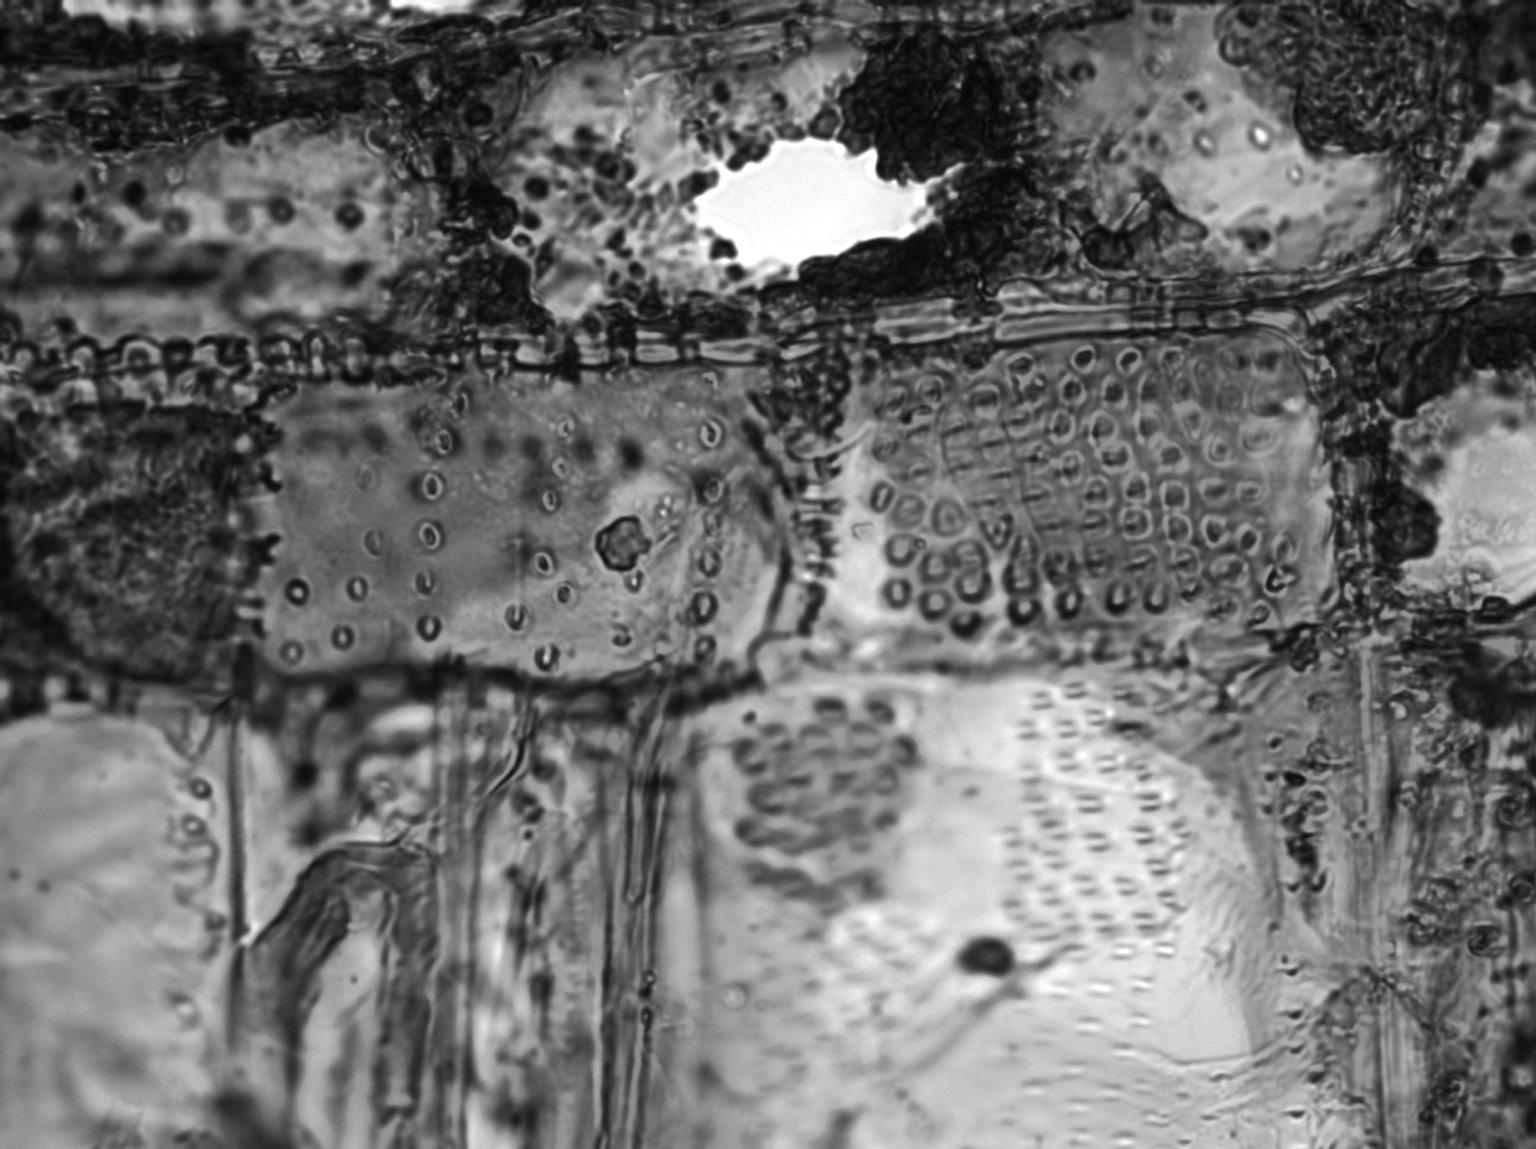 MALPIGHIACEAE Spachea elegans